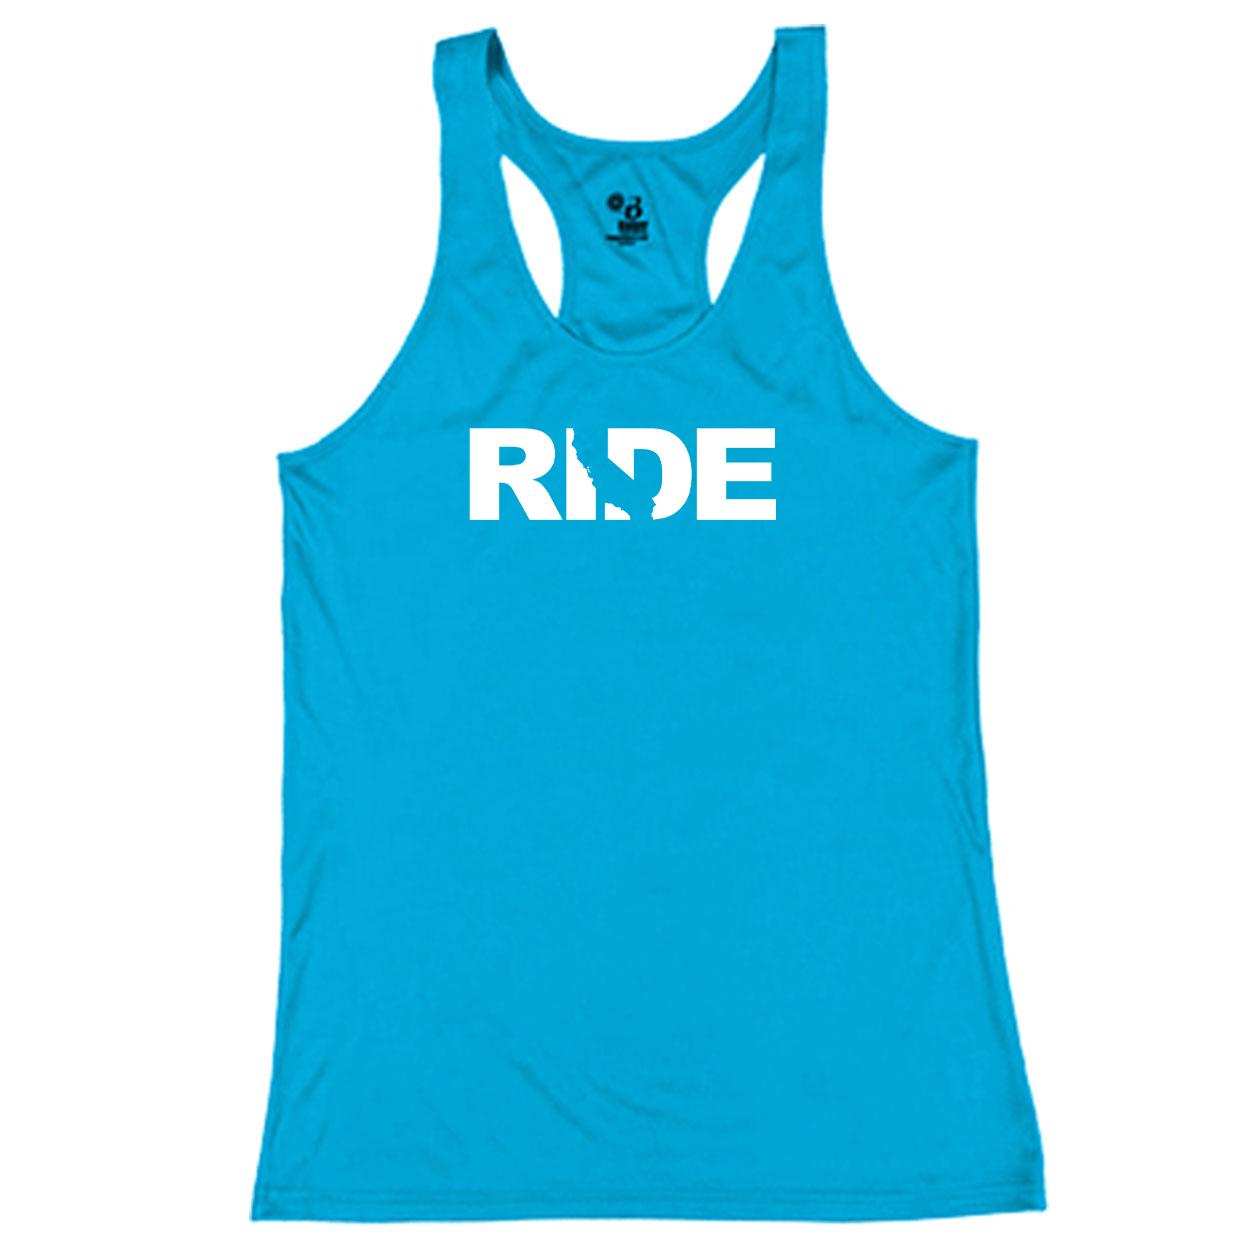 Ride California Classic Youth Girls Performance Racerback Tank Top Electric Blue (White Logo)